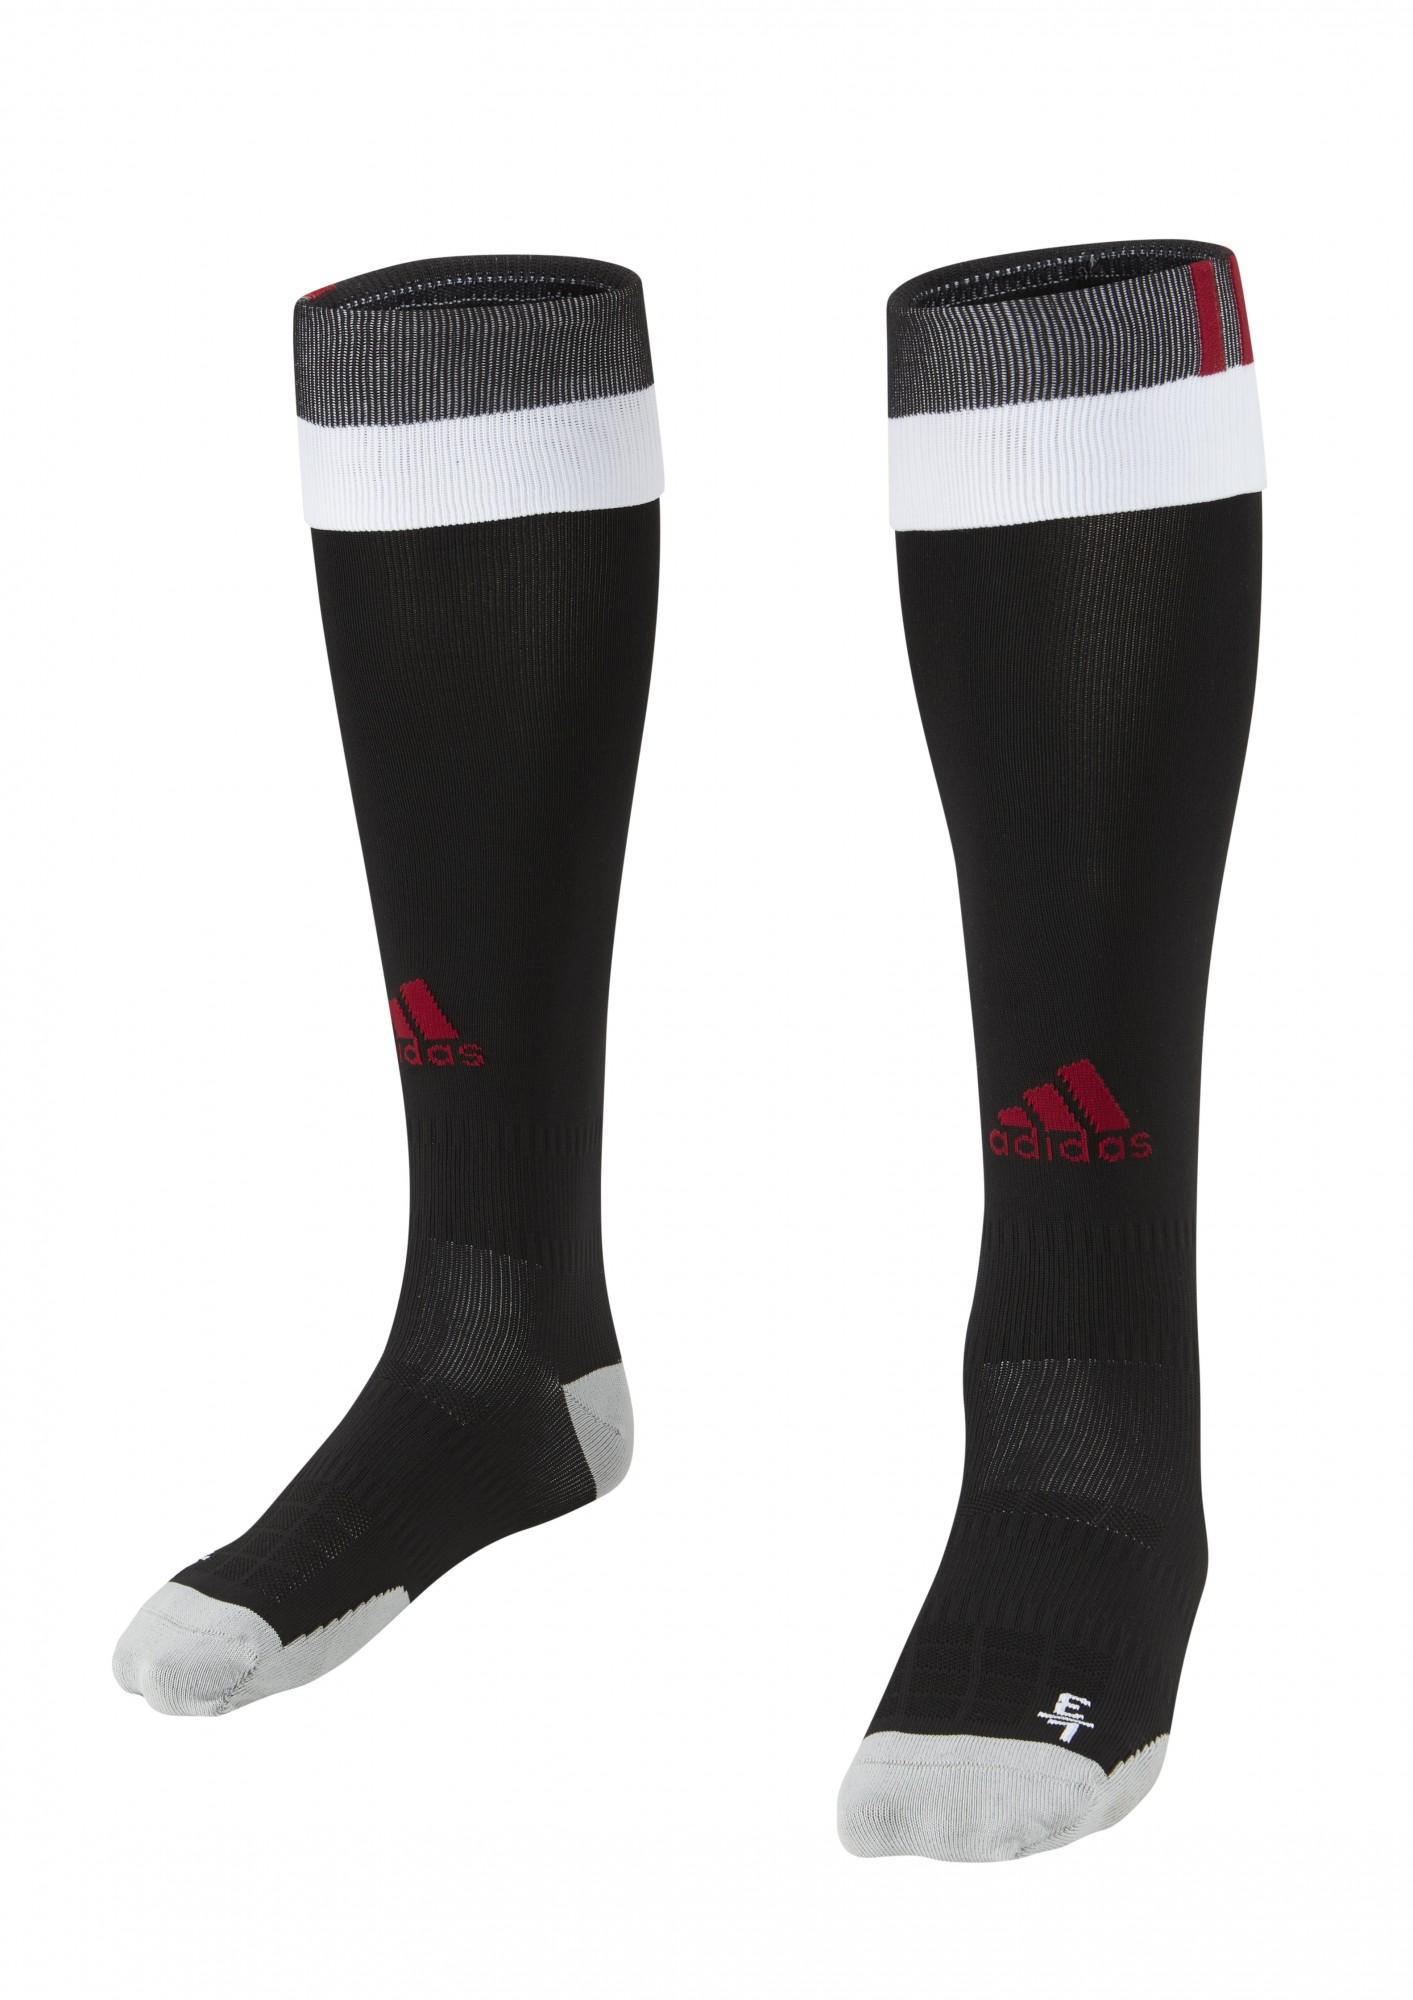 Sheffield United Home Kit 2016-17 socks